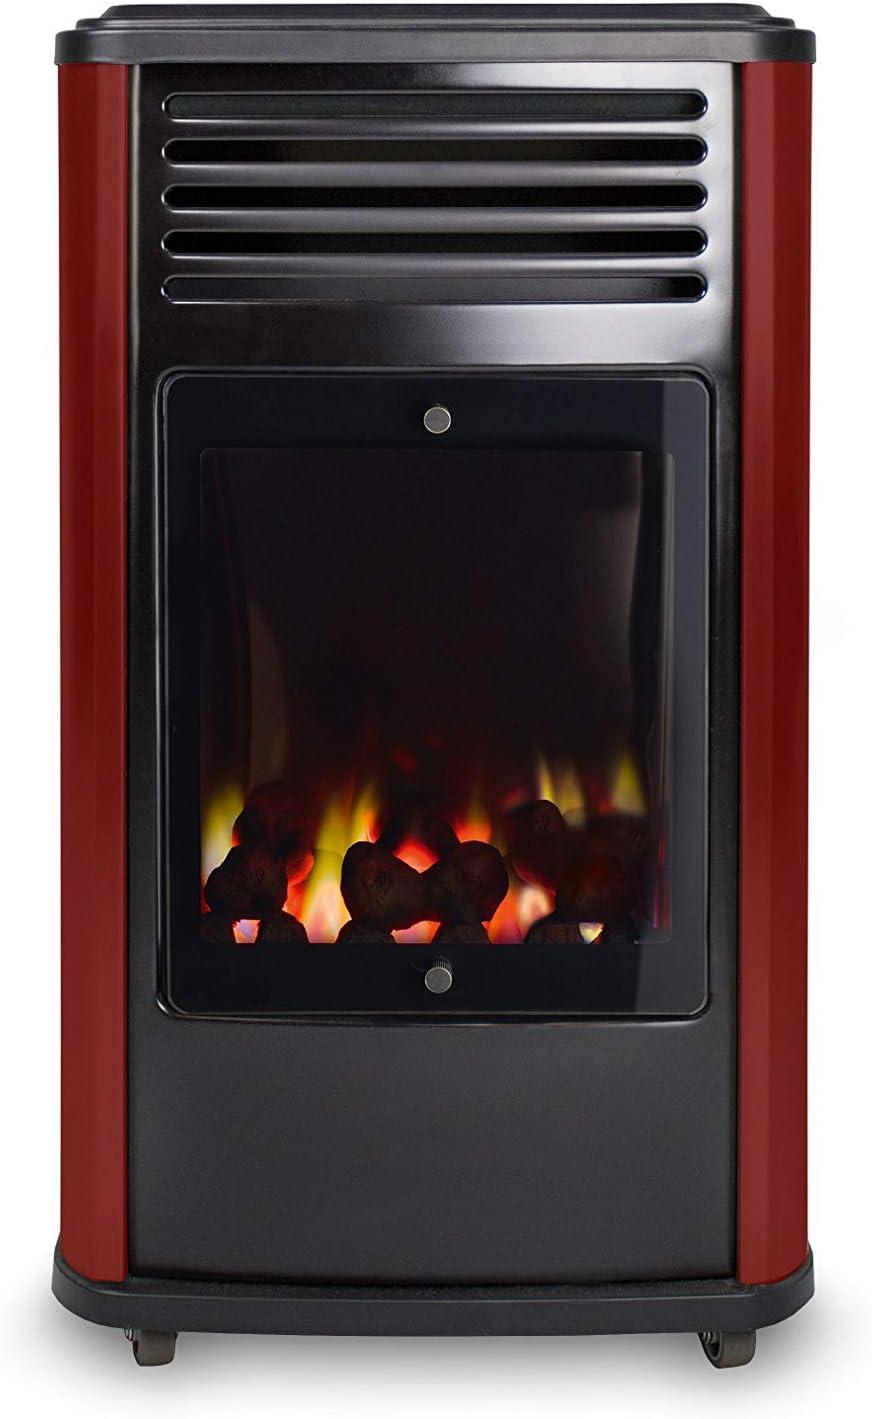 Estufa portátil a gas Manhattan Rojo Fireside 3,4 kW